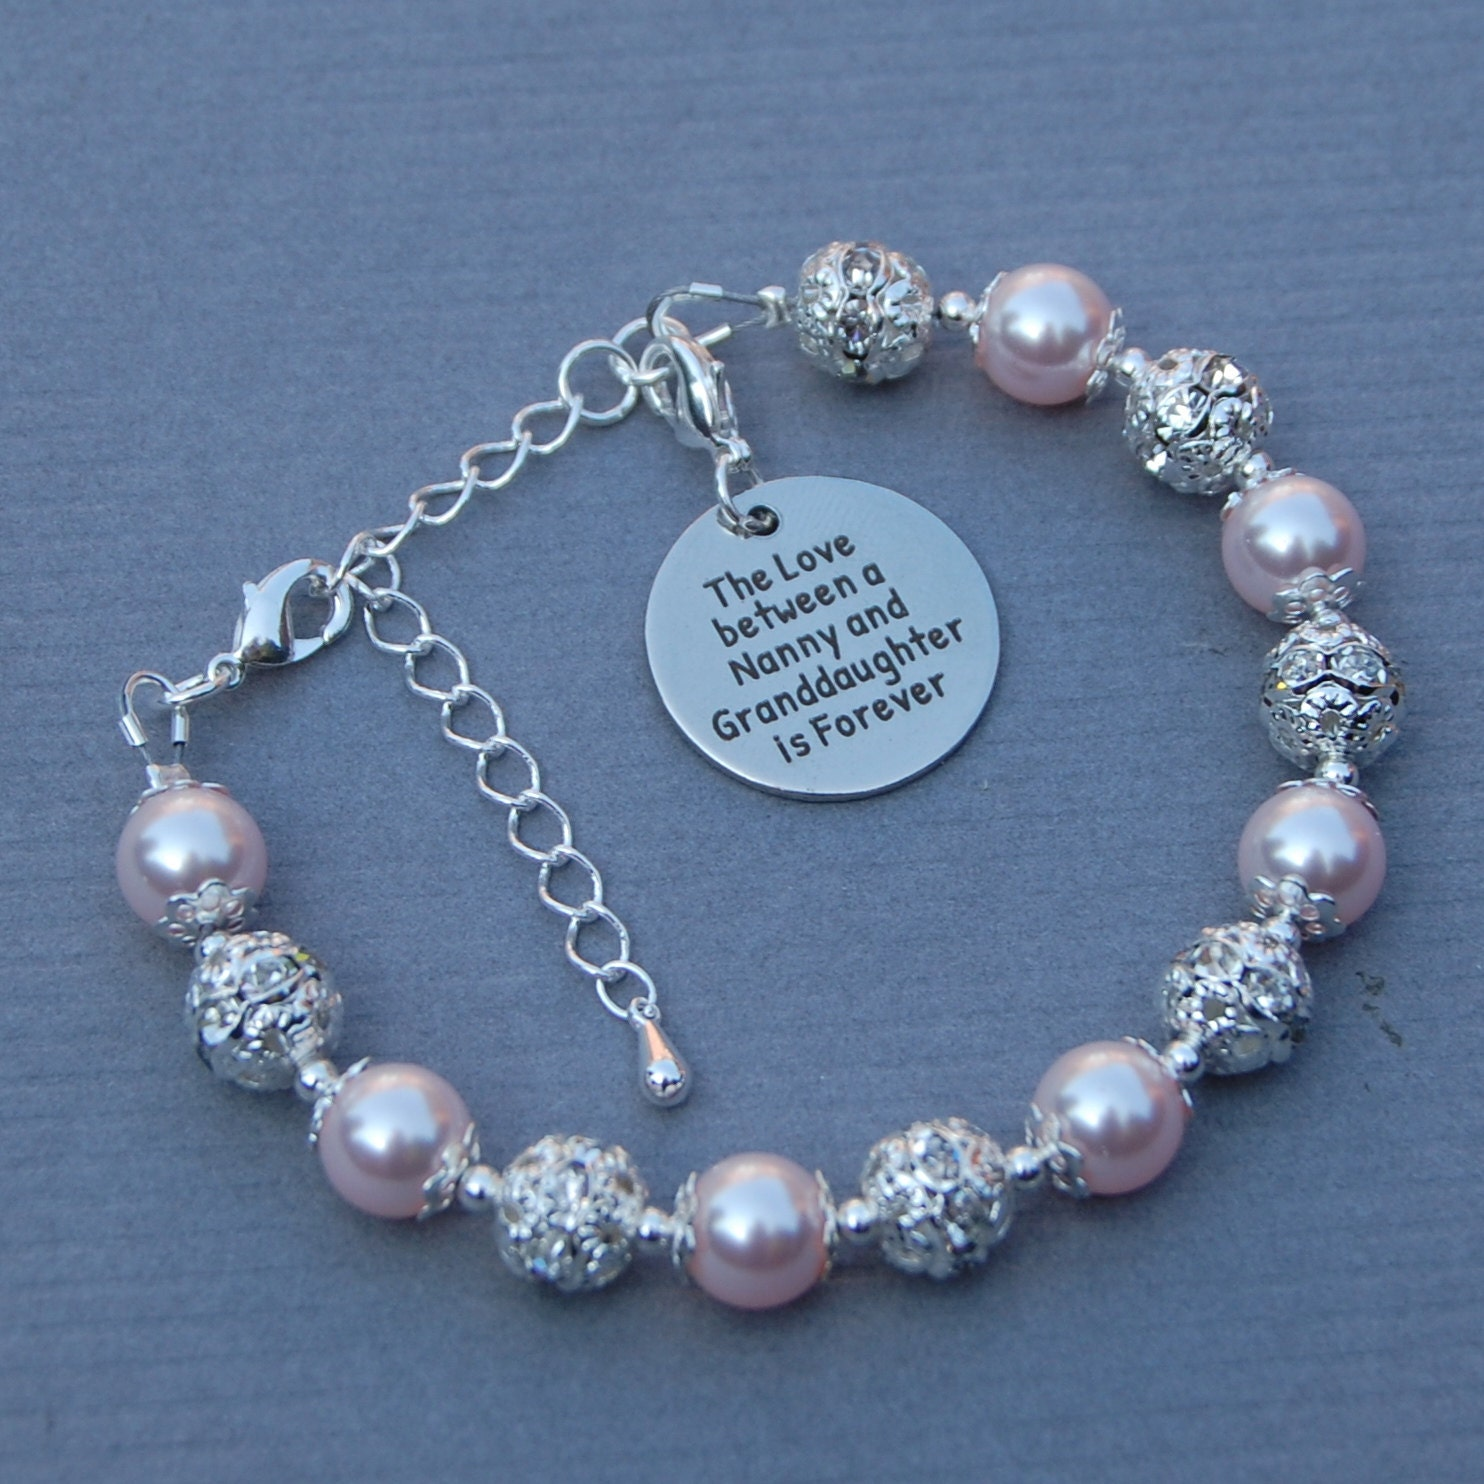 Wedding Gift For Granddaughter : Nanny Granddaughter Gift Nanny Granddaughter Jewelry Nanny